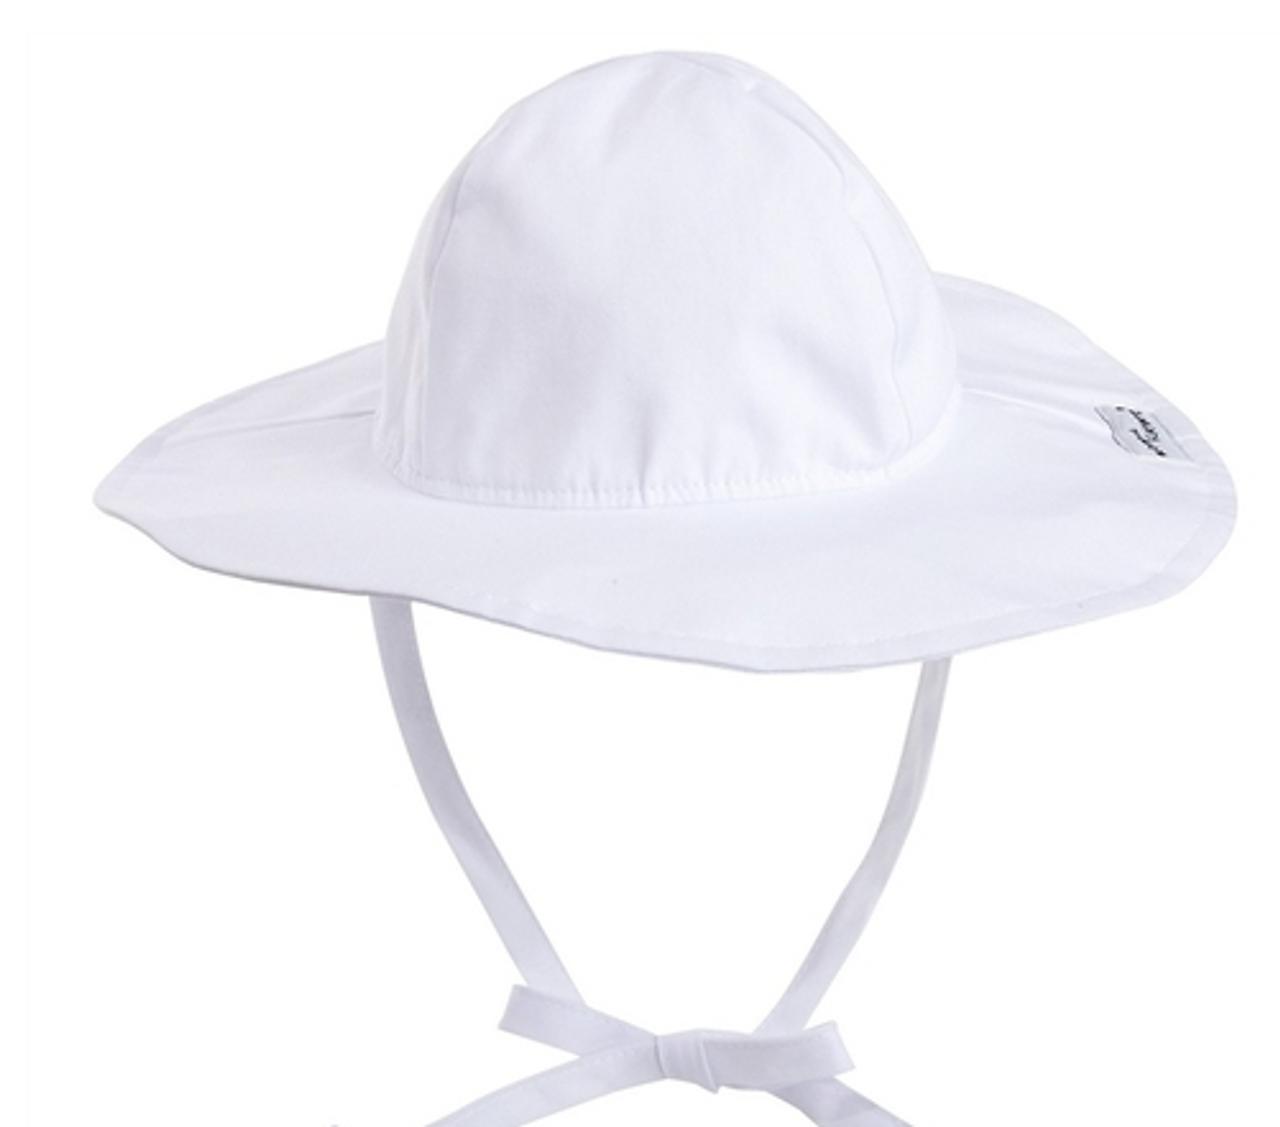 467c0ab48cd Flap Happy The Floppy Hat White Toddler Unisex